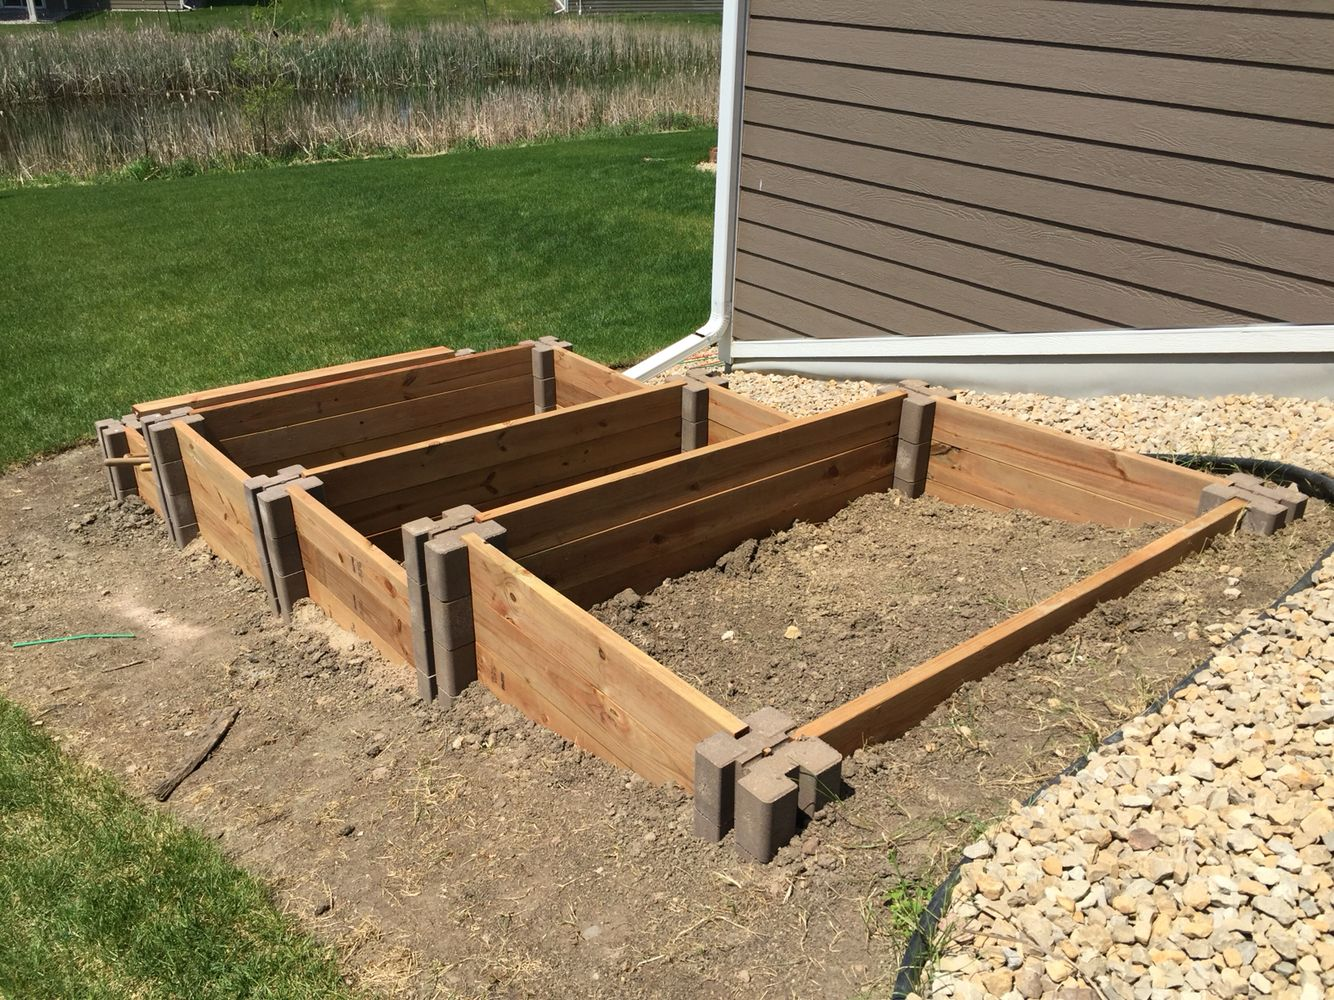 Backyard Raised Garden Ideas 20 raised bed garden designs and beautiful backyard landscaping ideas Raised Garden Bed On Sloped Area